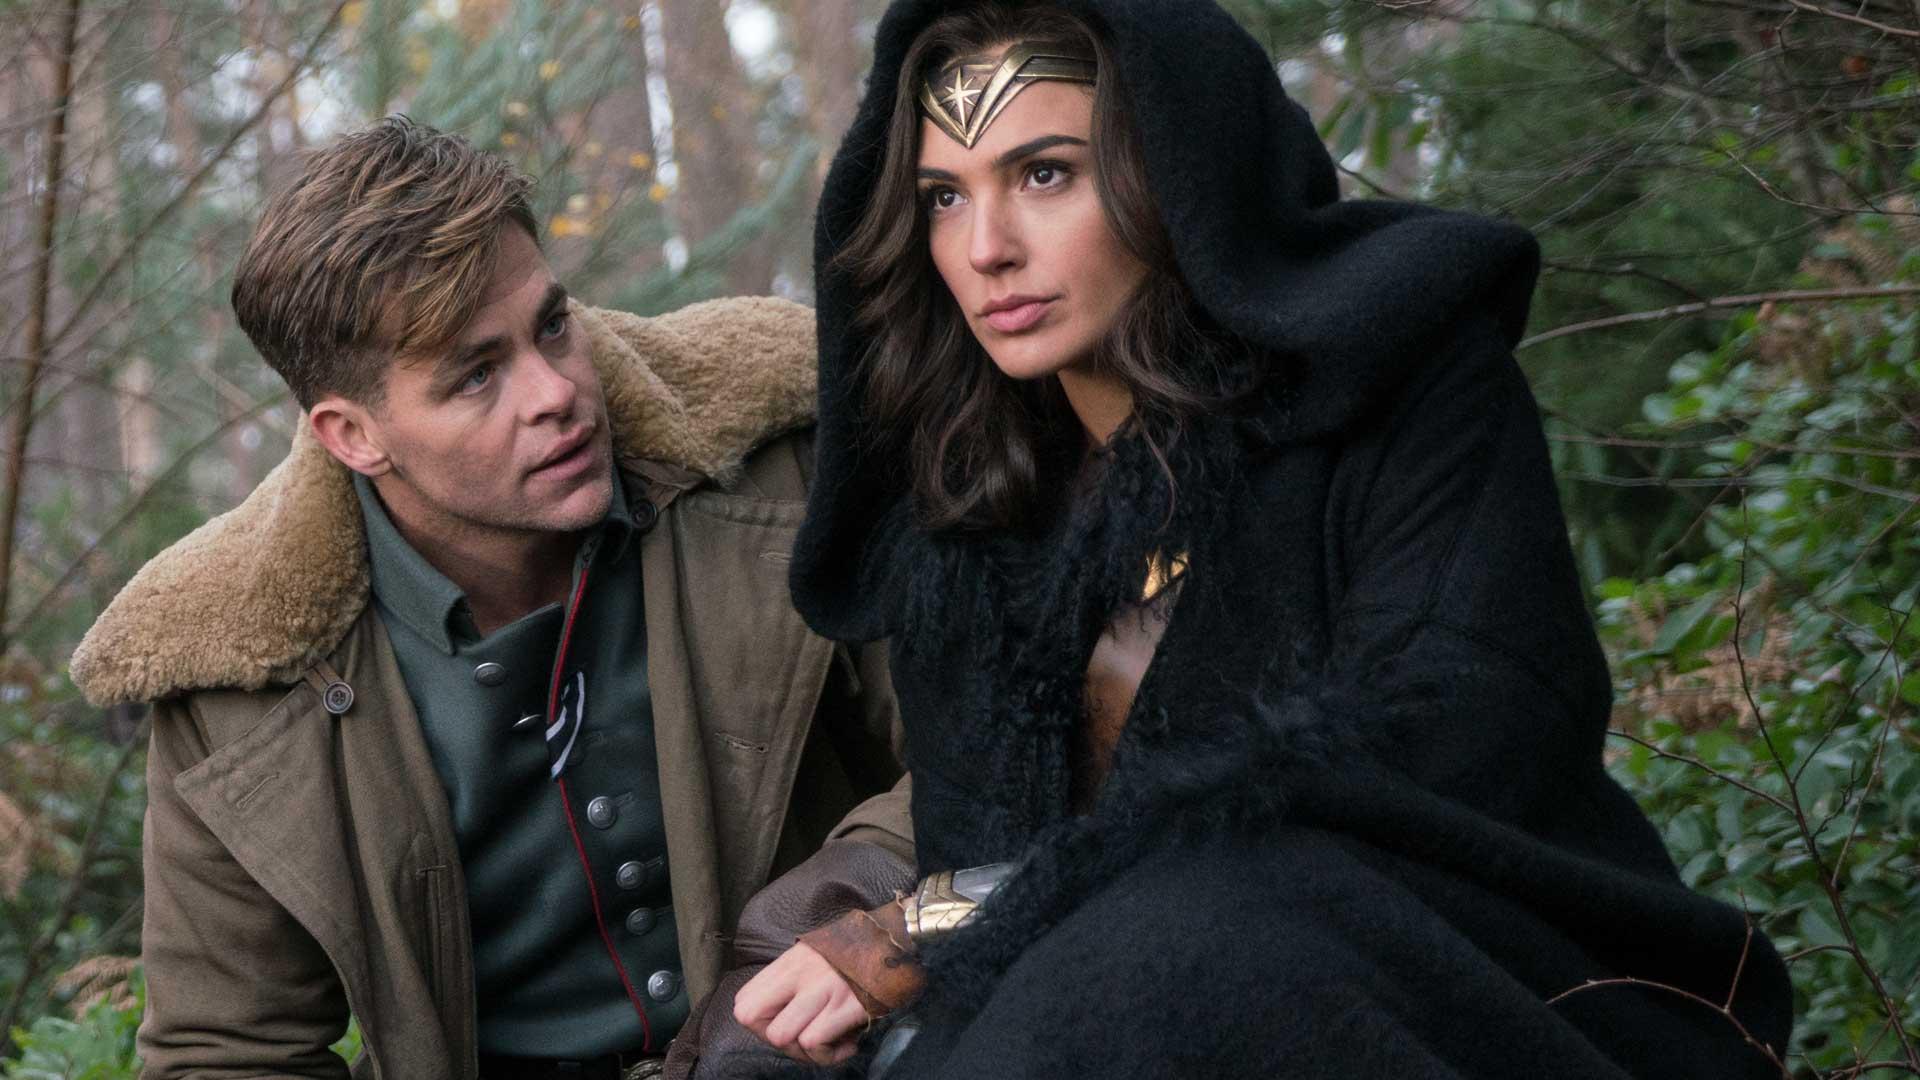 WW Steve and Diana